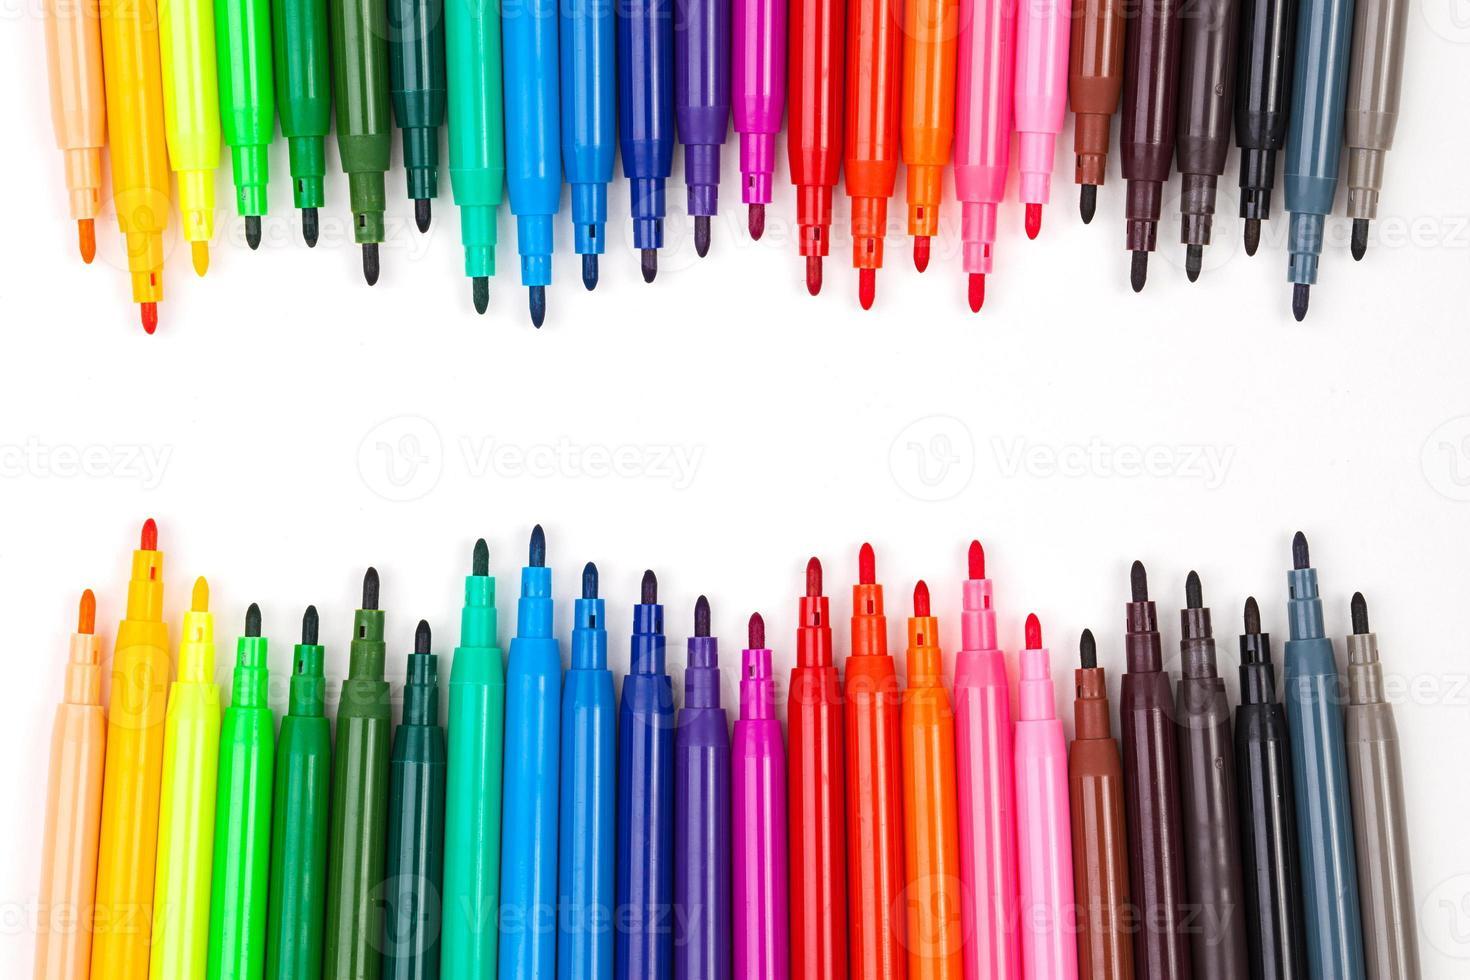 kleur pen foto